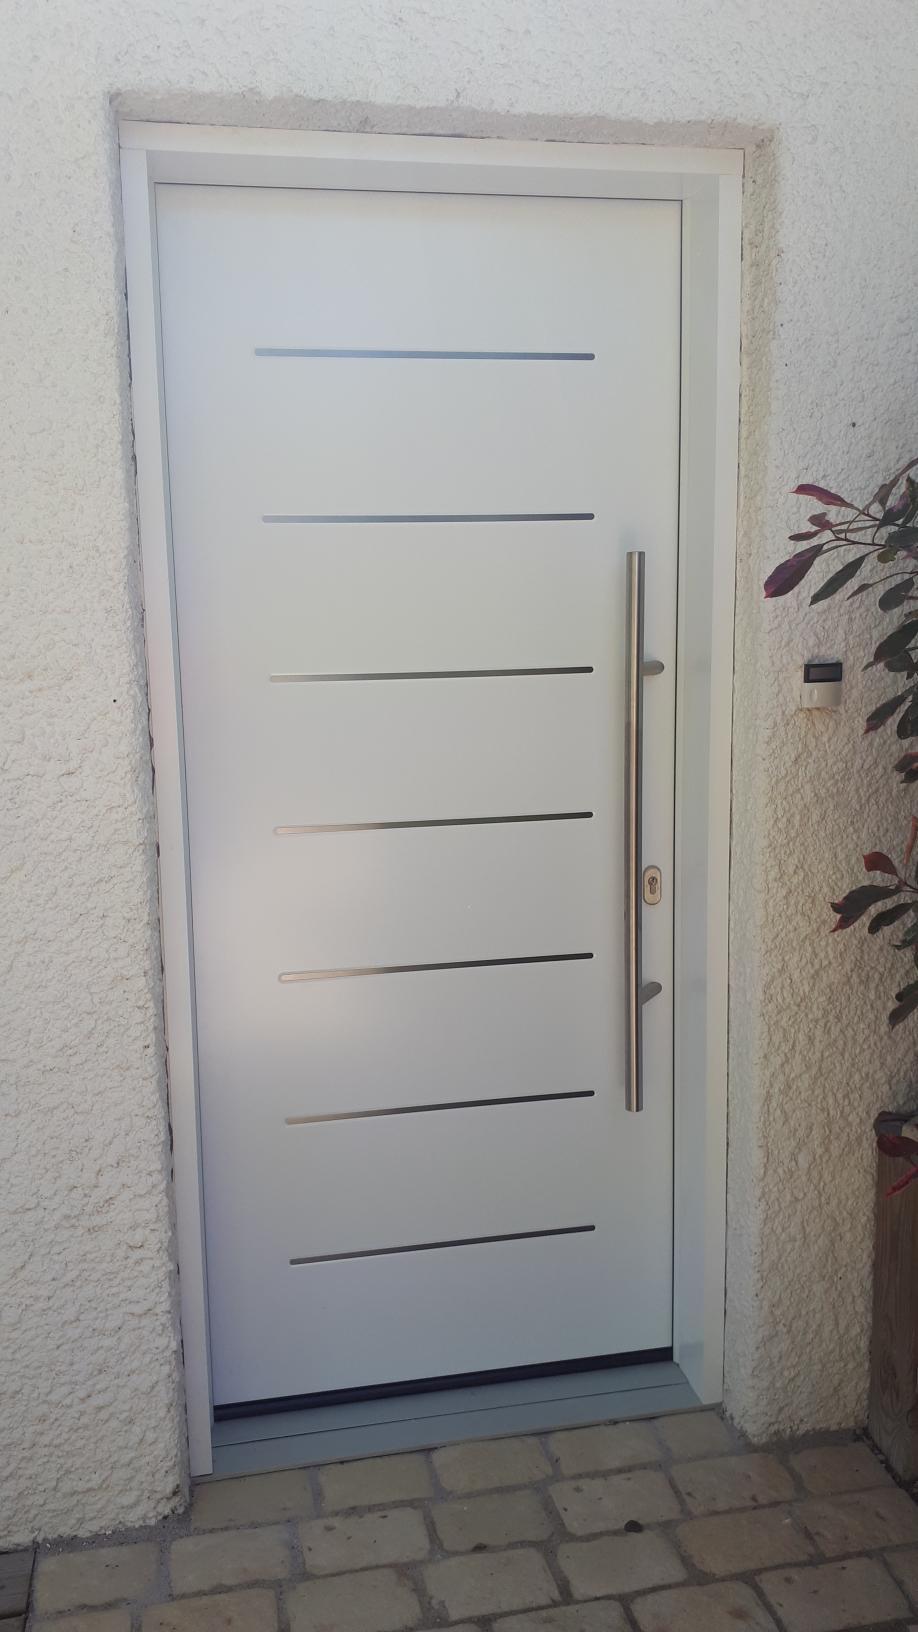 porte-blanche-menuiserie-chevallier-freres-orleans-2